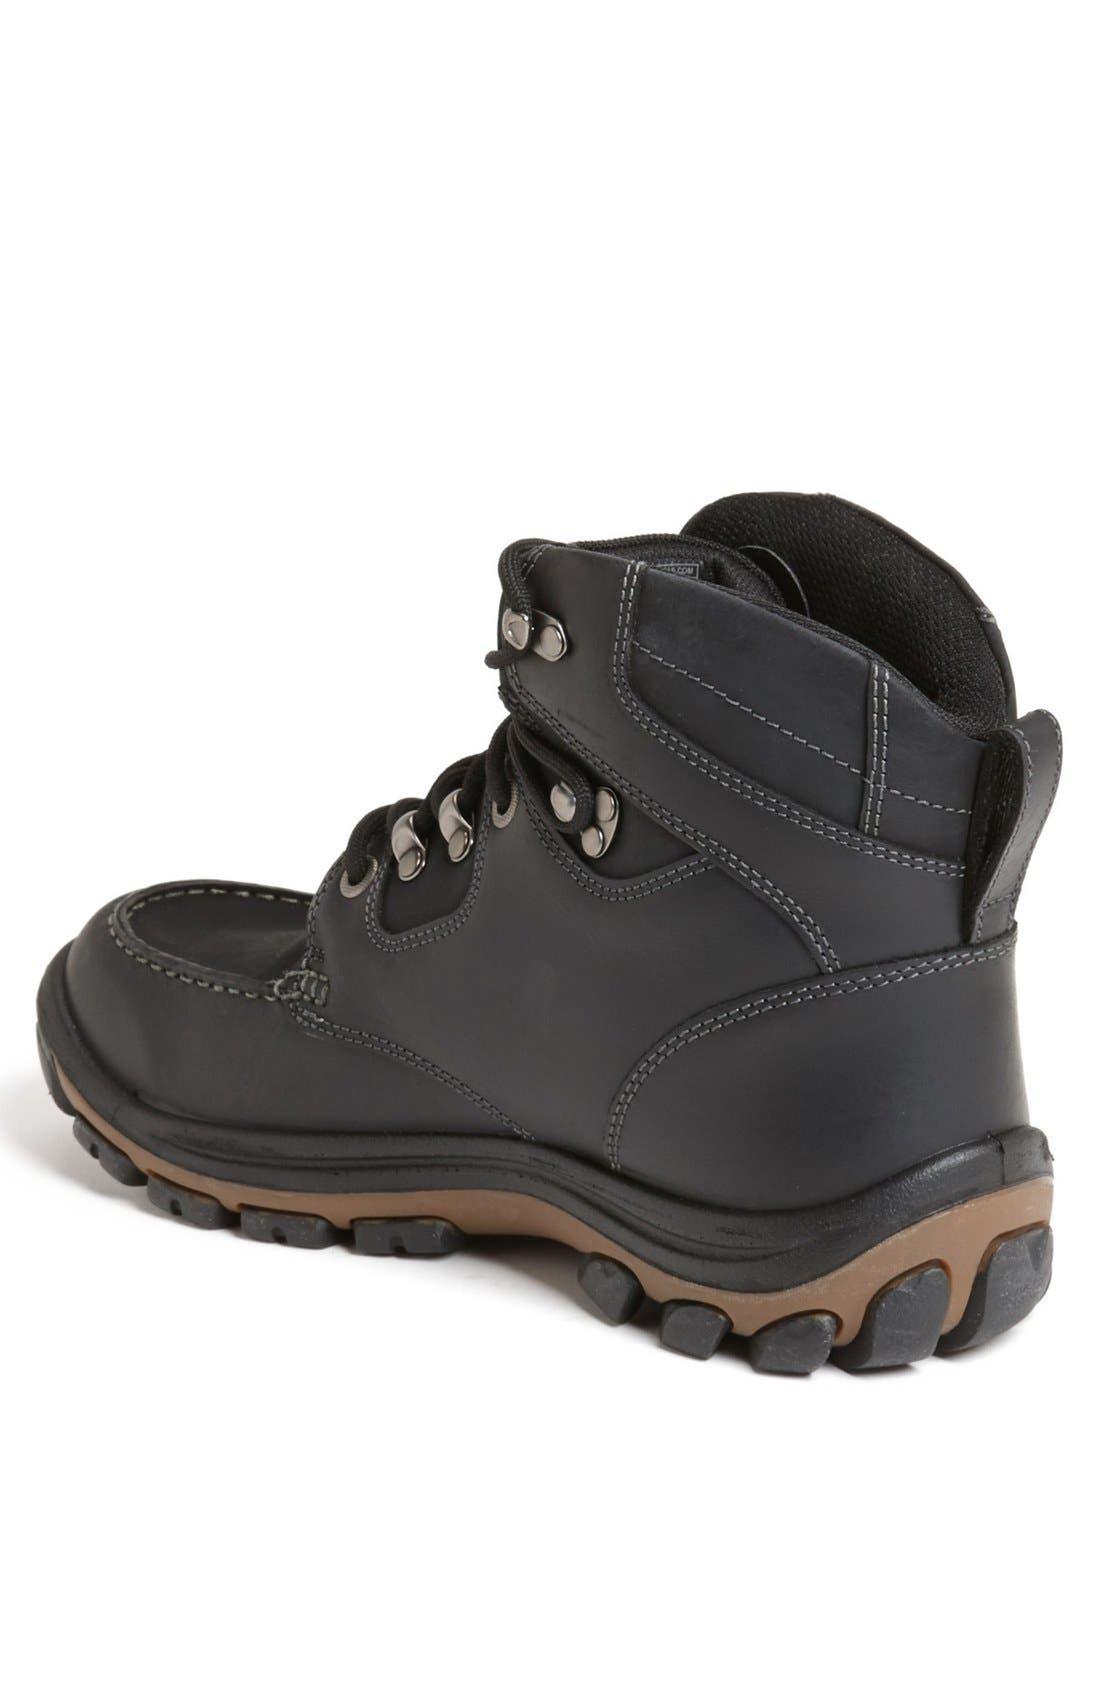 Alternate Image 2  - Keen 'Nopo' Boot